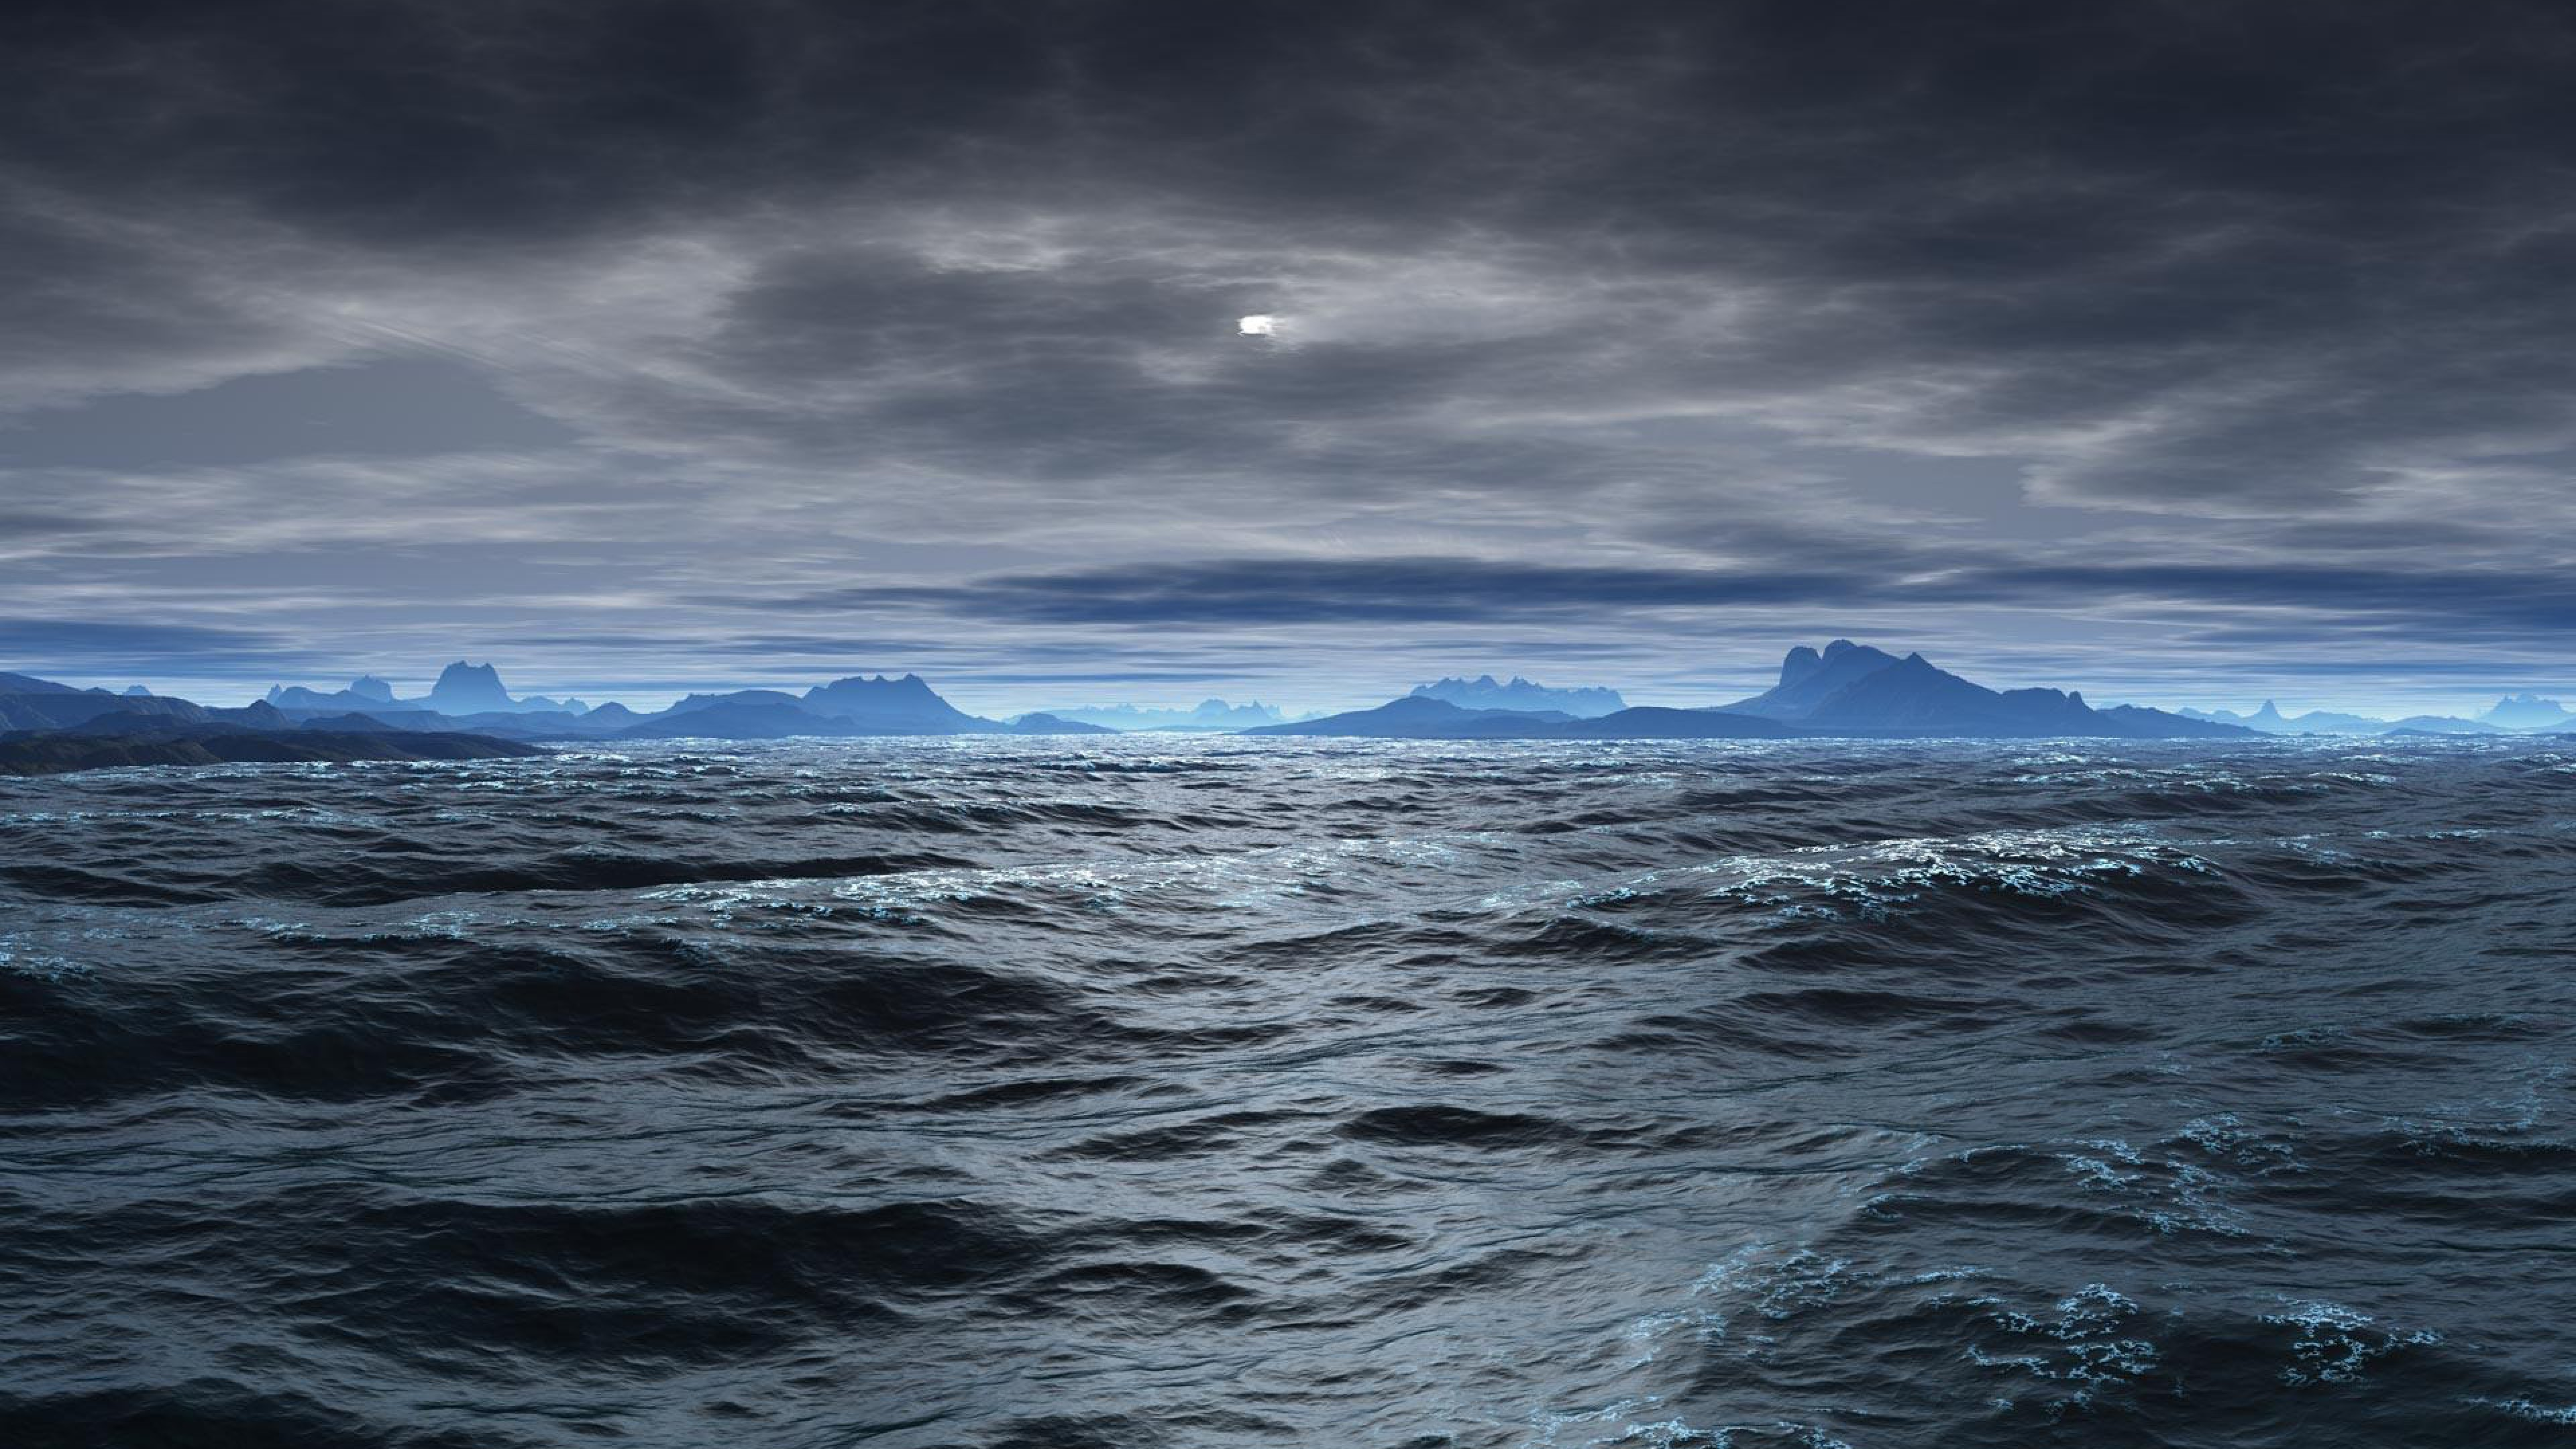 Wallpaper Ocean with storm clouds